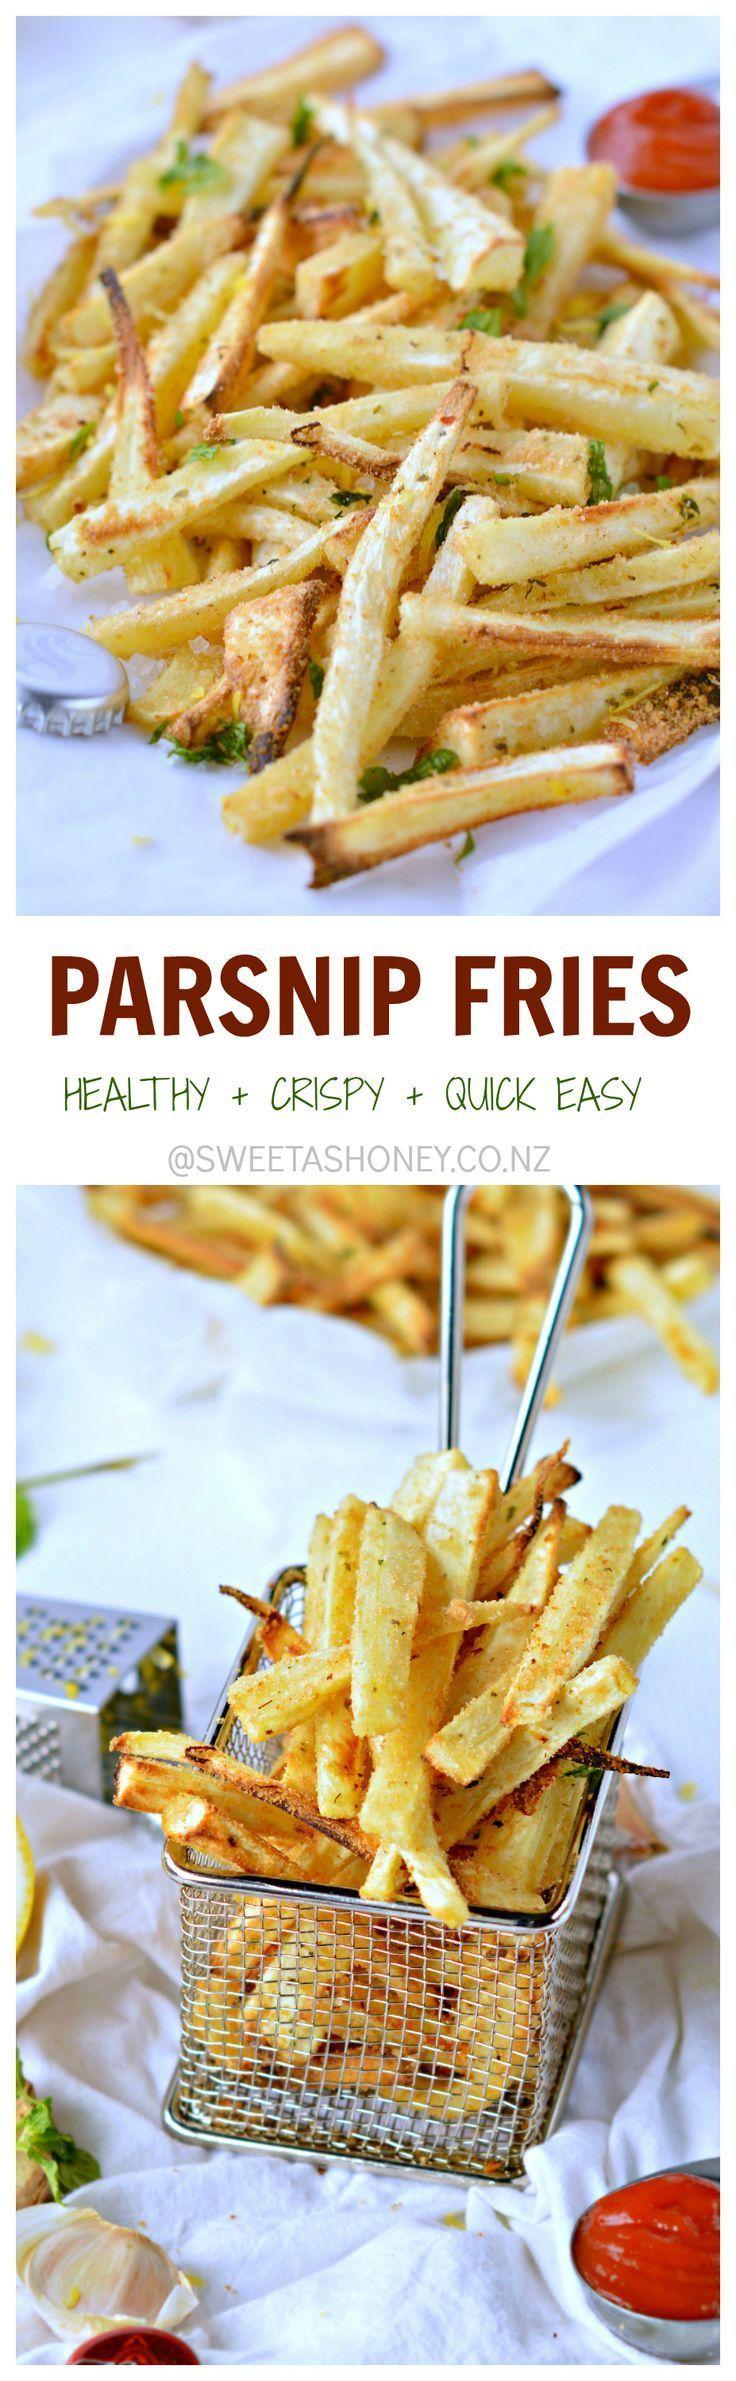 Super addictive Healthy Crispy Parsnip Fries with lemon + olive oil + mint + garlic. Only 85 kcal/100 g, 4WW.